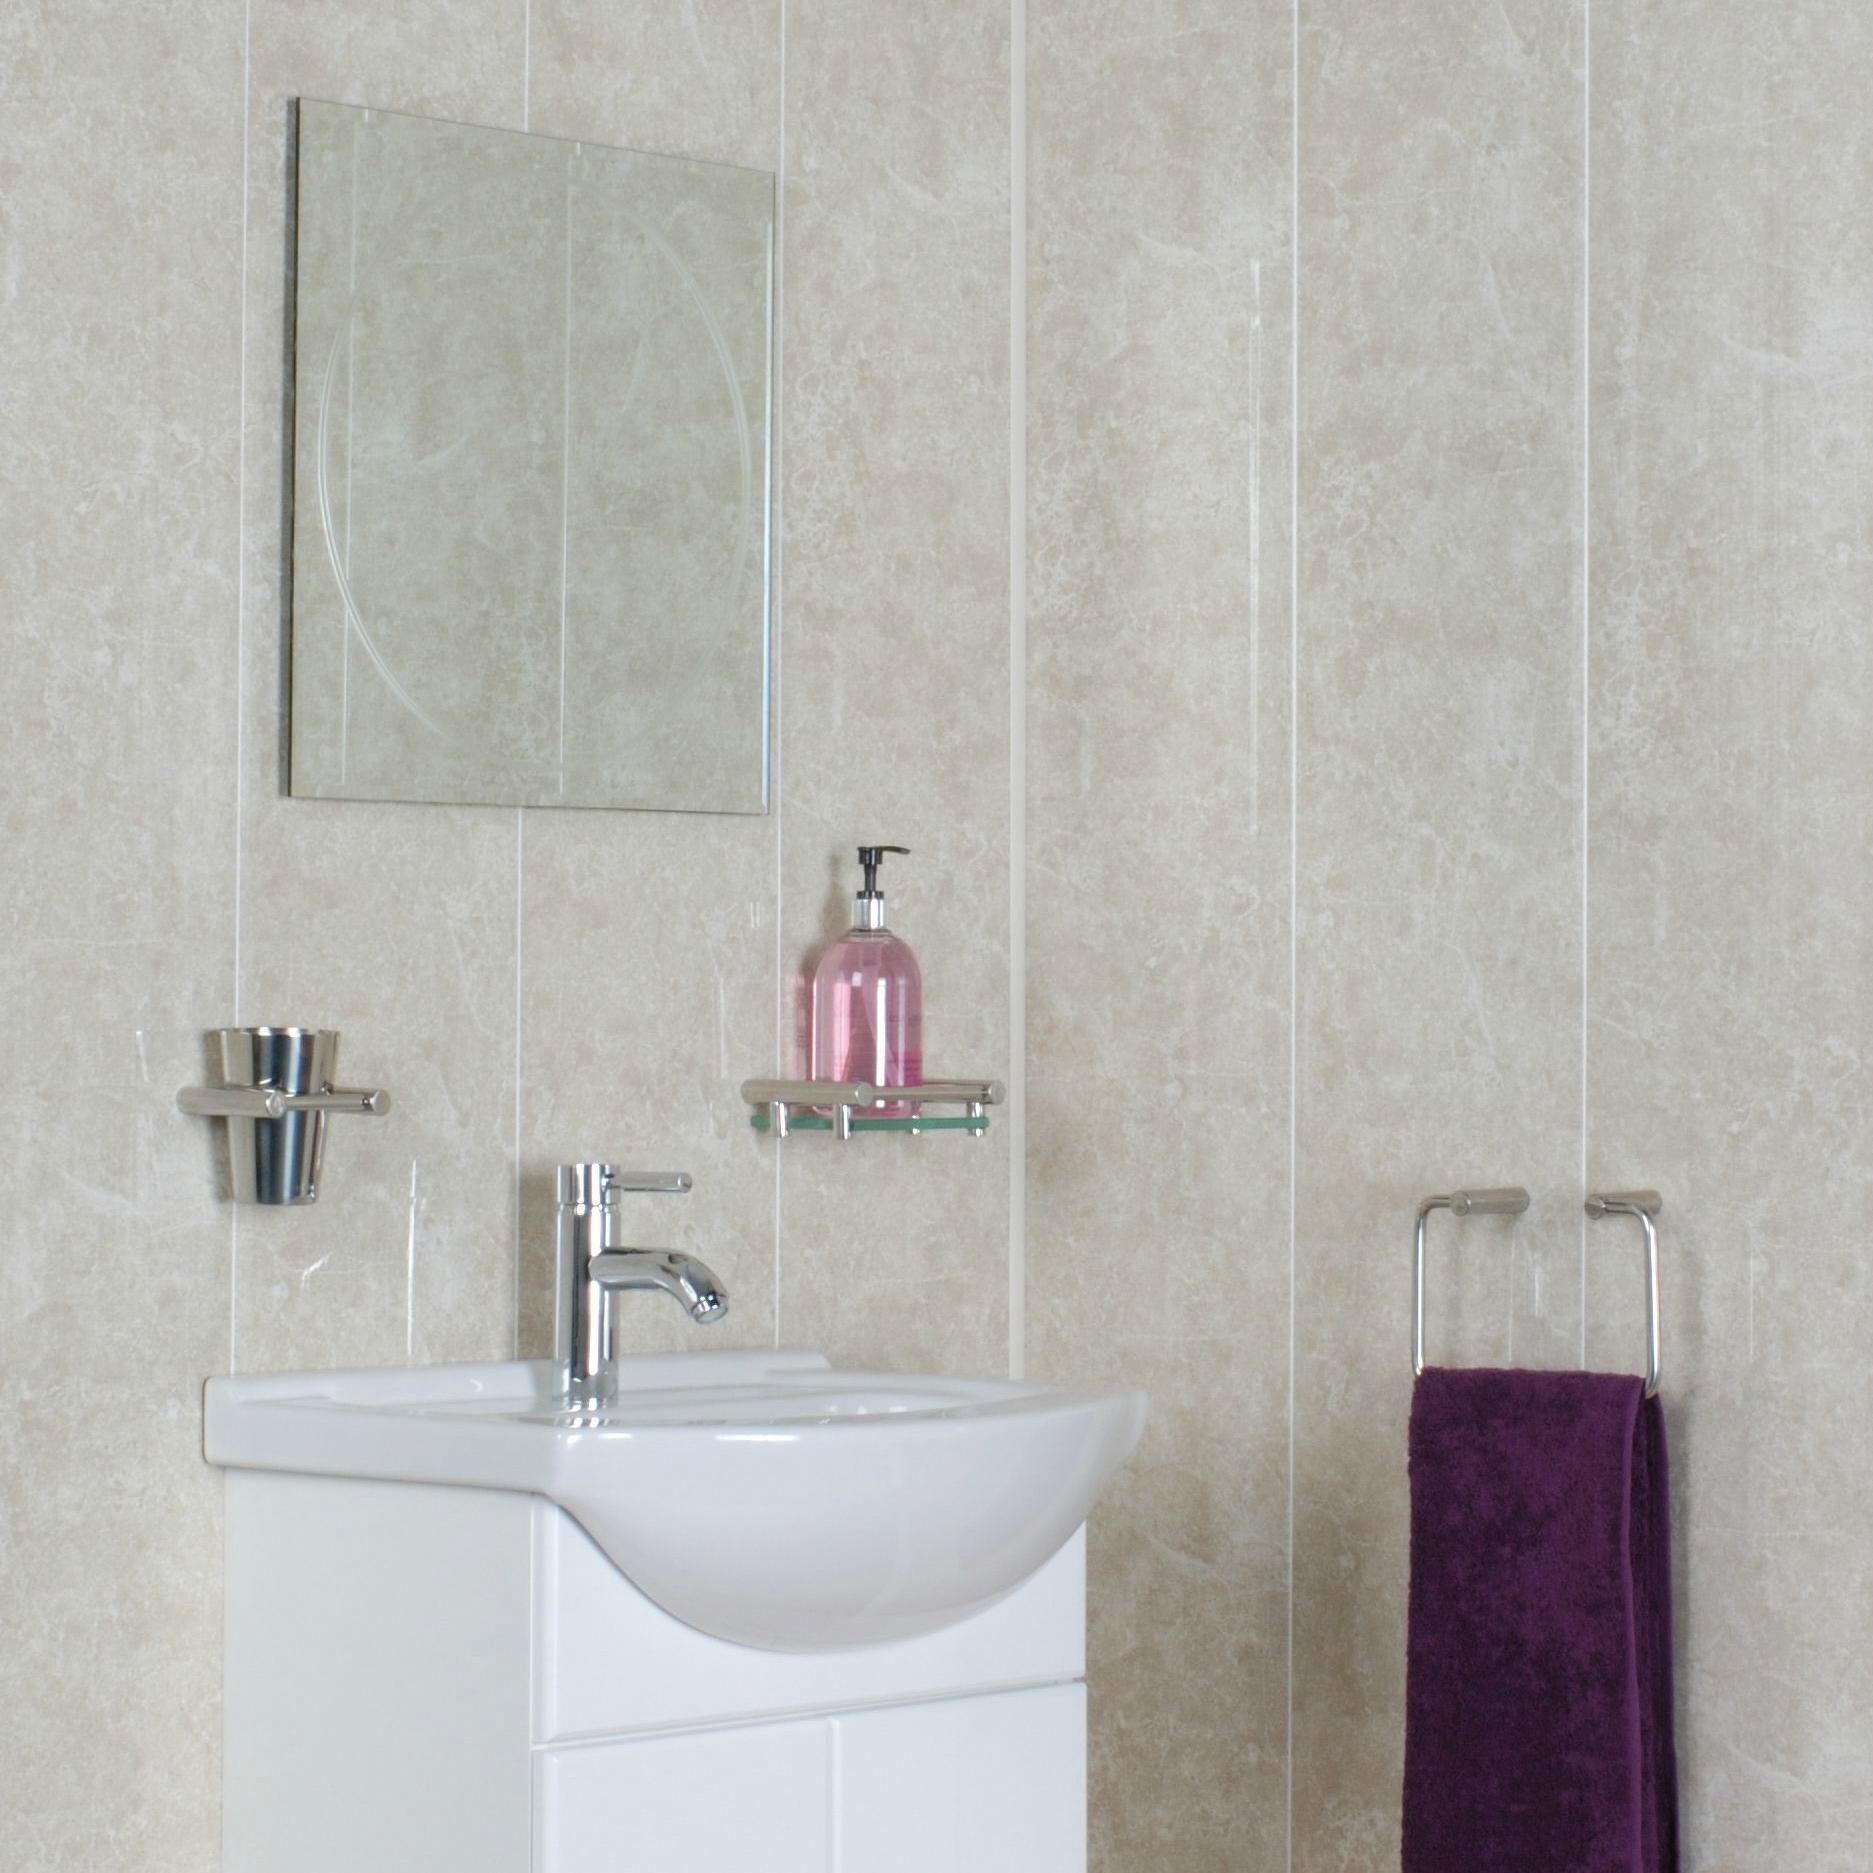 Bathroom wall panels 200mm · 250mm FBMUIBA